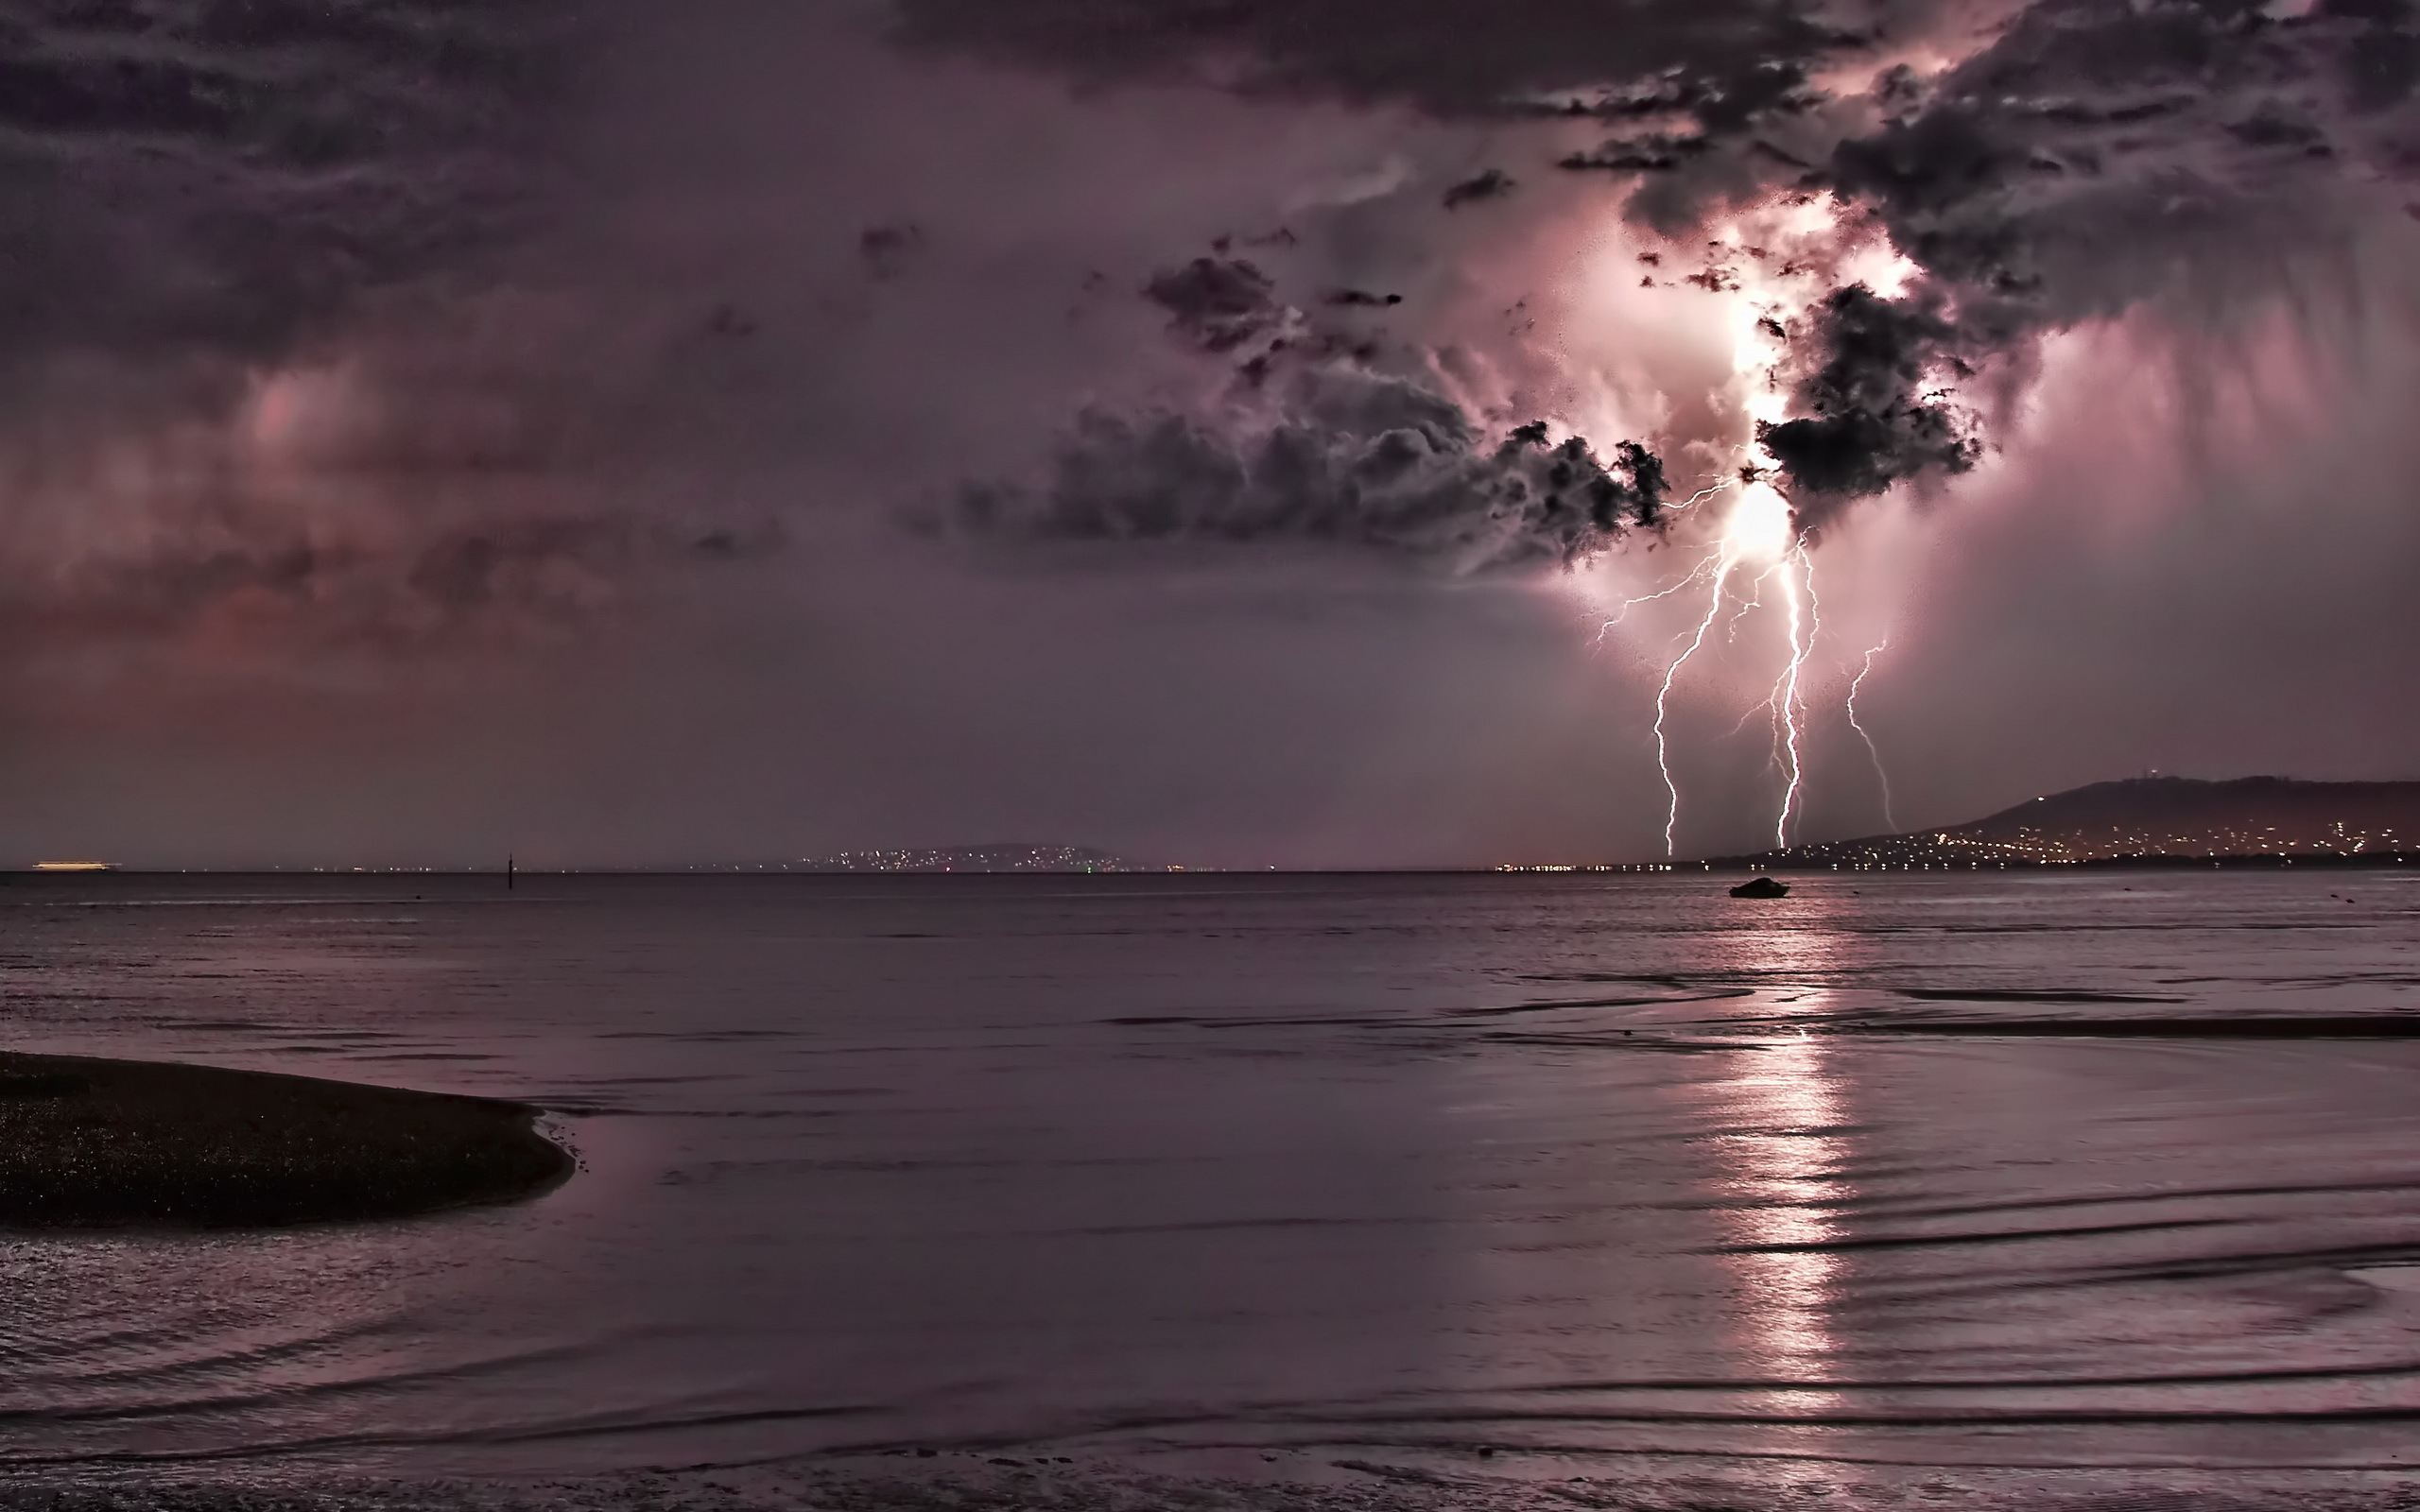 Thunderstorm Wallpaper 2560x1600px 905088 2560x1600